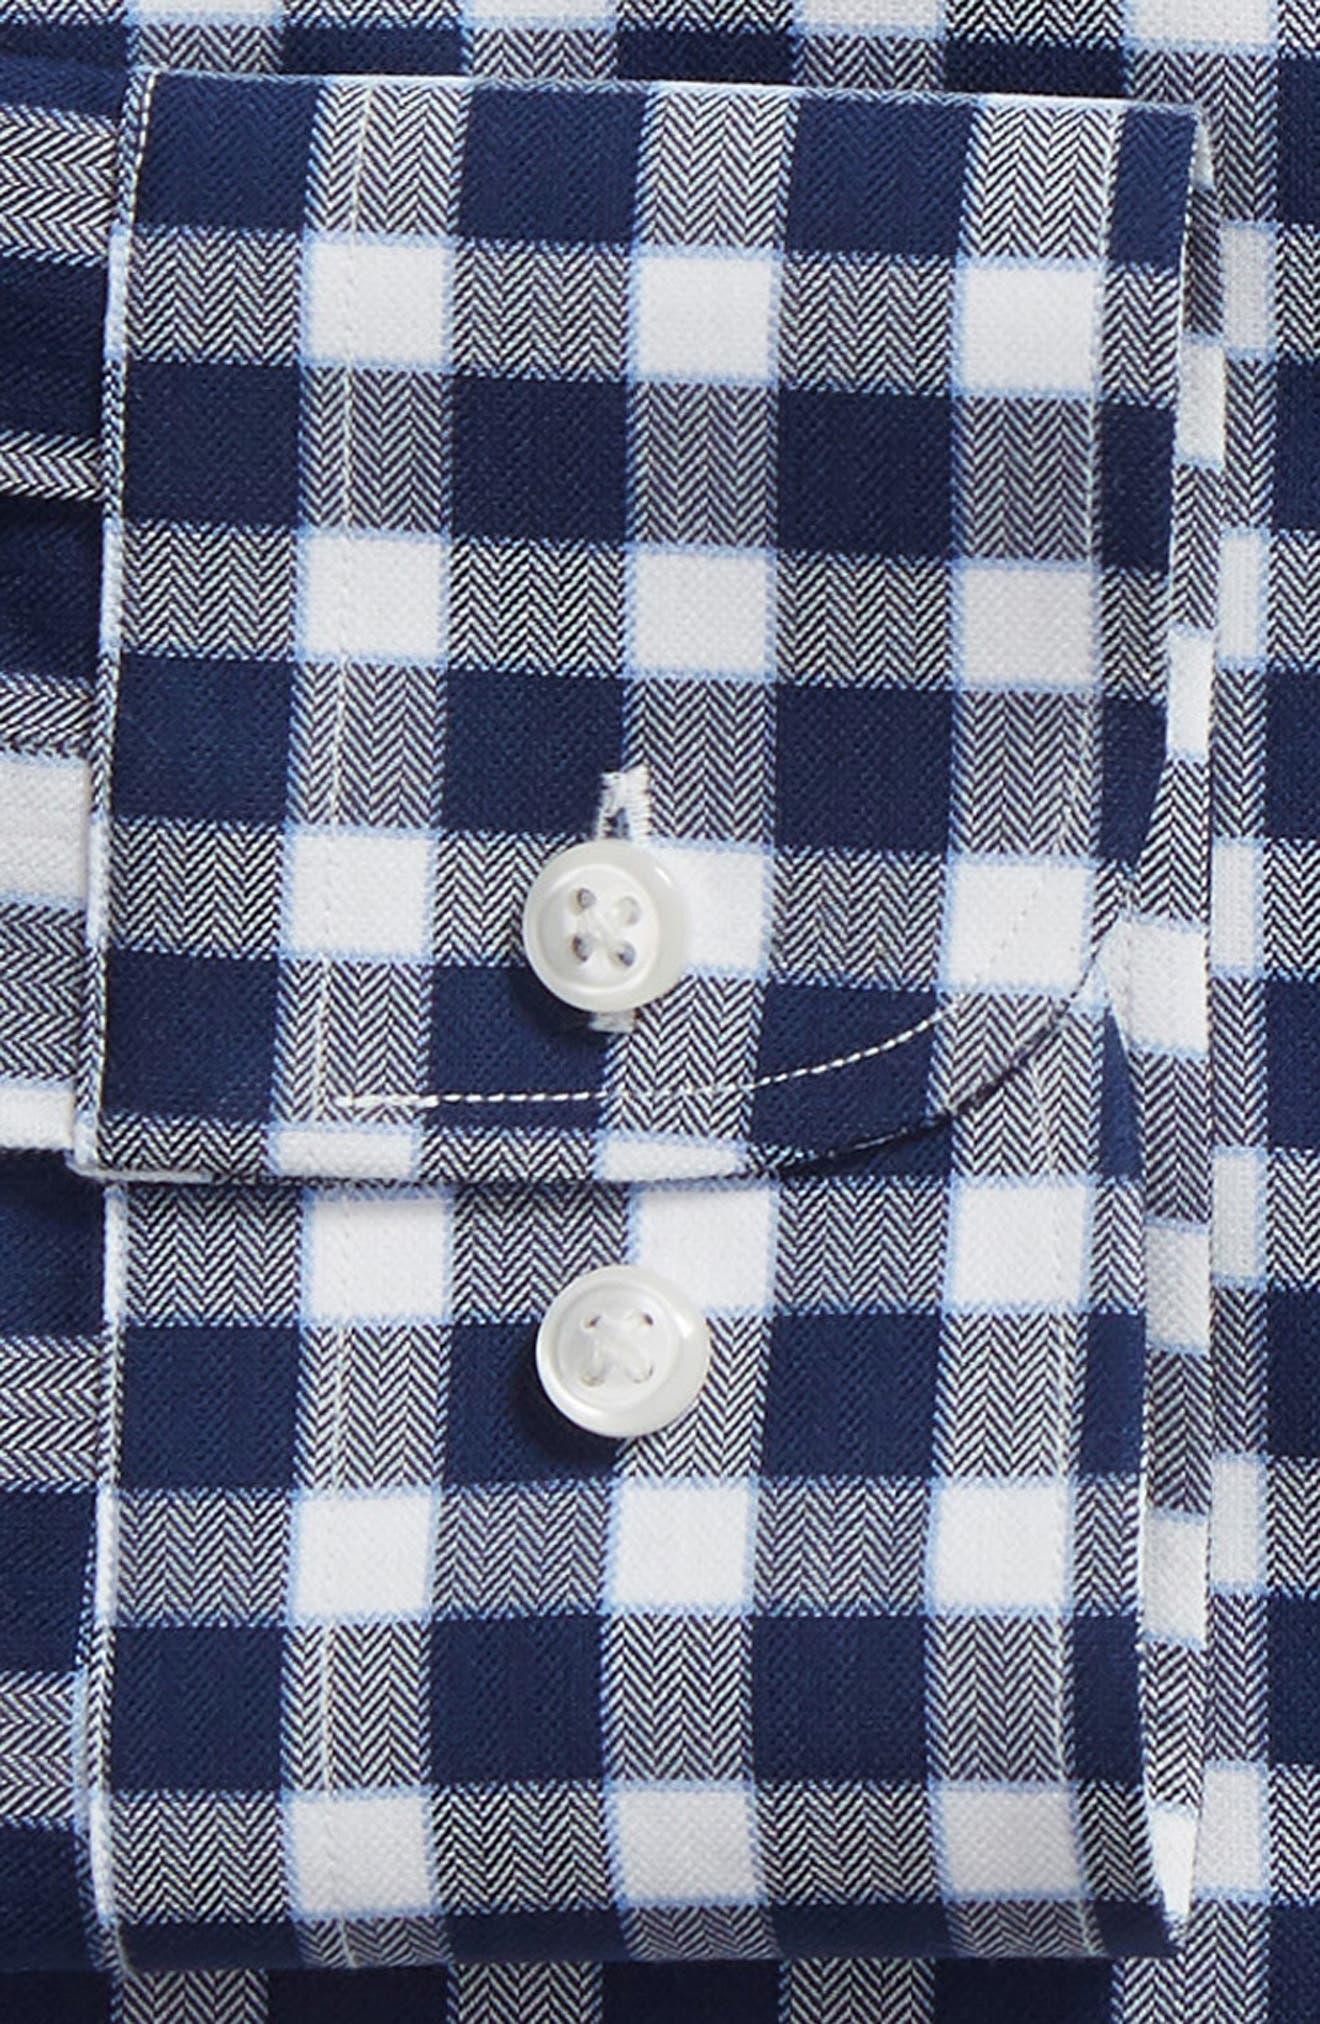 Tech-Smart Trim Fit Stretch Check Dress Shirt,                             Alternate thumbnail 6, color,                             NAVY PEACOAT